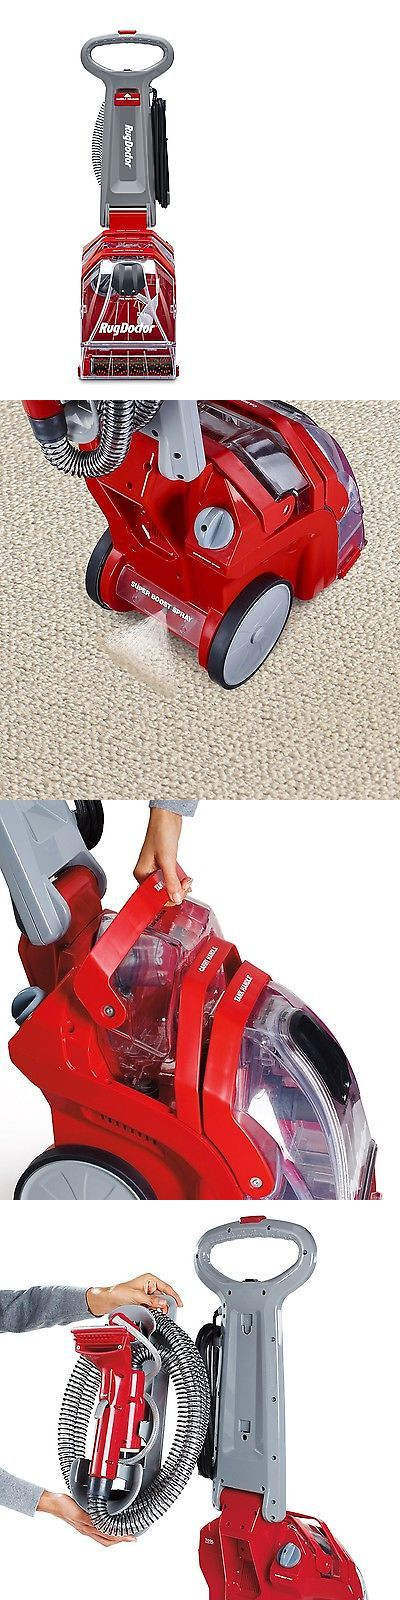 Carpet Shampooers 177746: Rug Doctor Deep Carpet Cleaner And Rug Doctor Pet  Pro Carpet Cleaner64